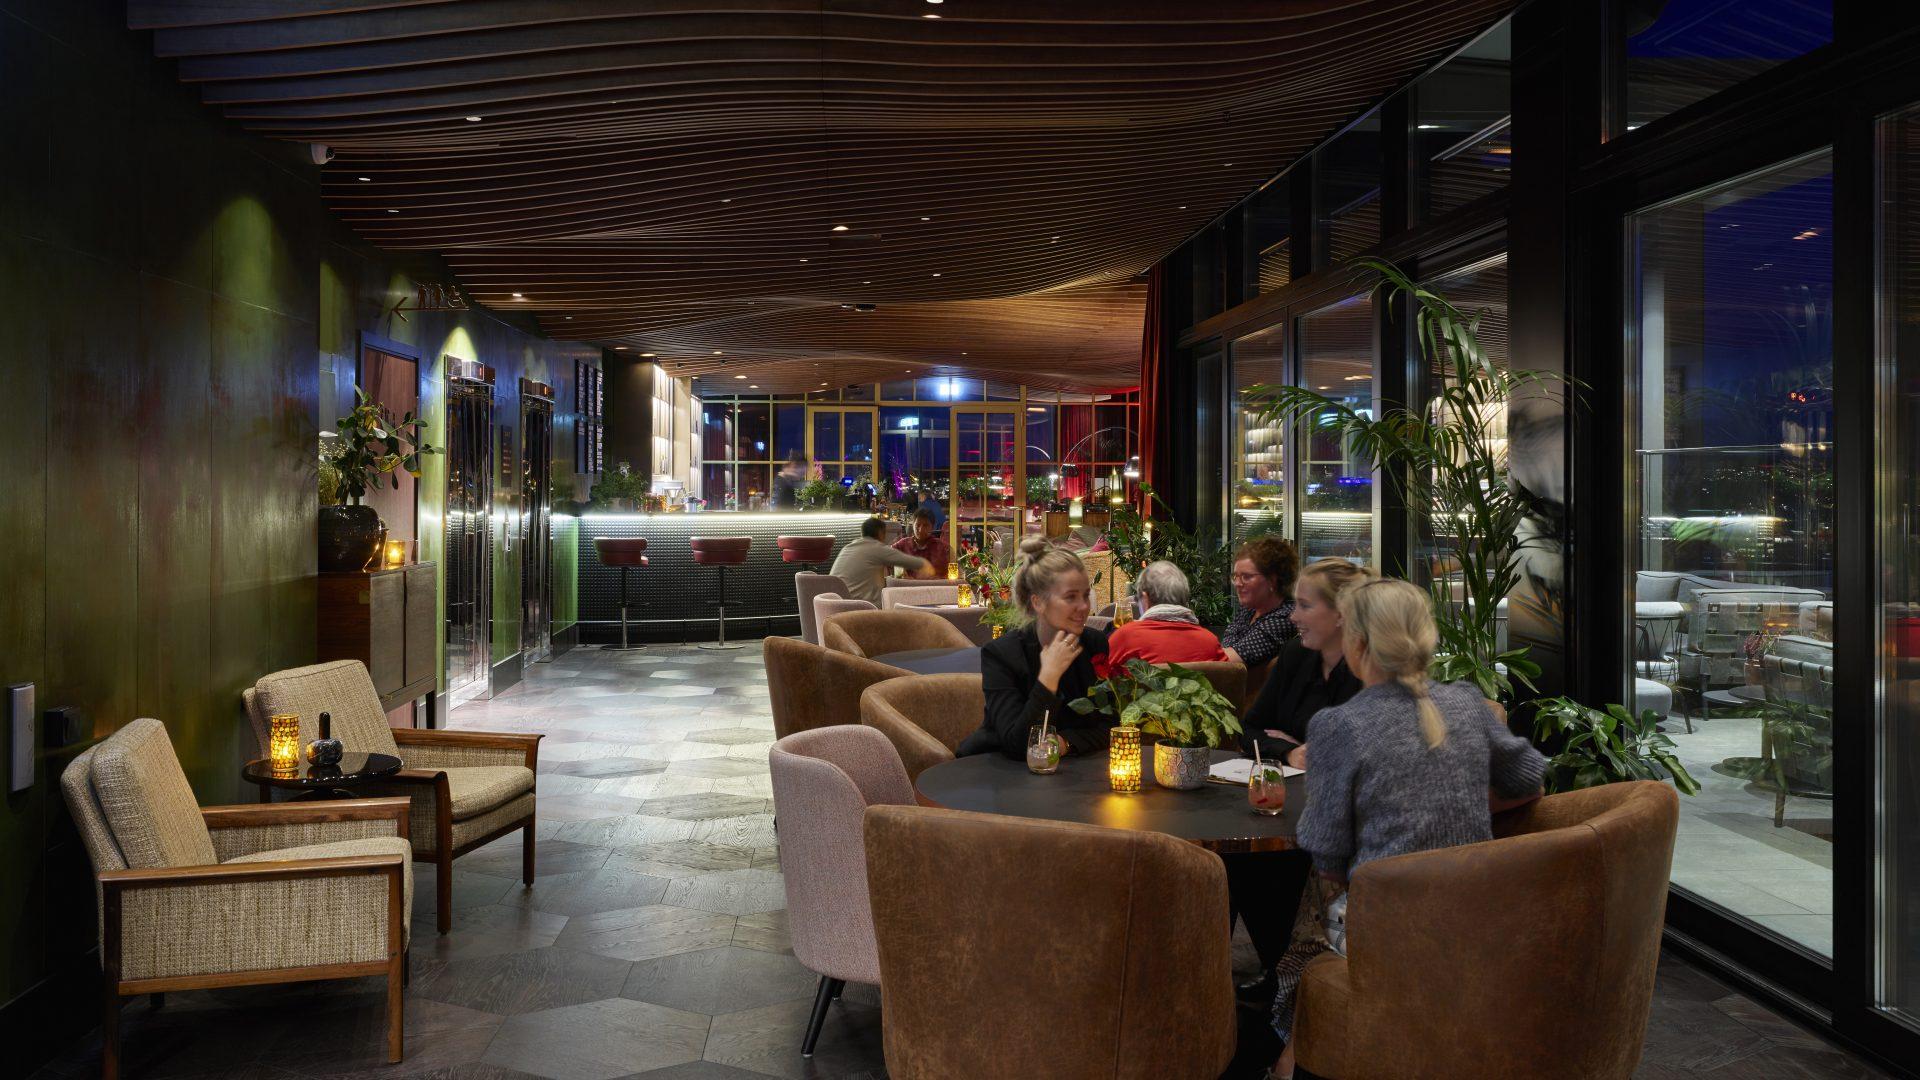 Quality Hotel Skjærgården, Langesund